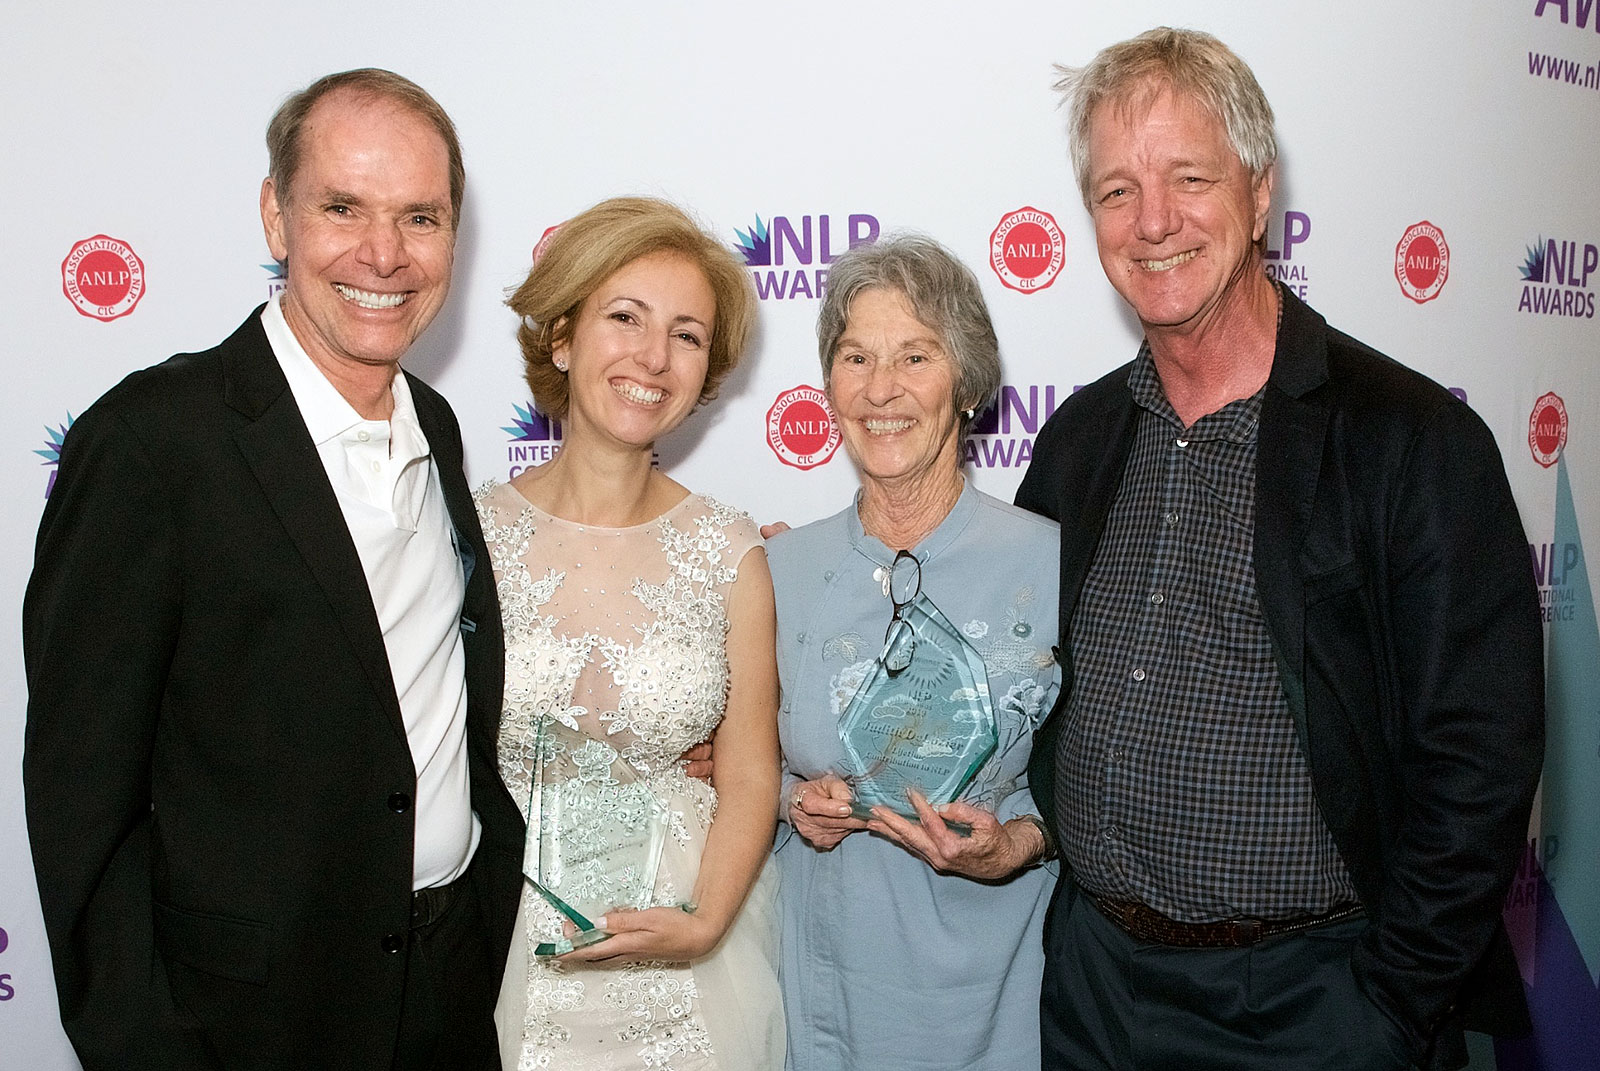 Rita Aleluia com Robert Dilts e Judith DeLozier no NLP Awards 2019